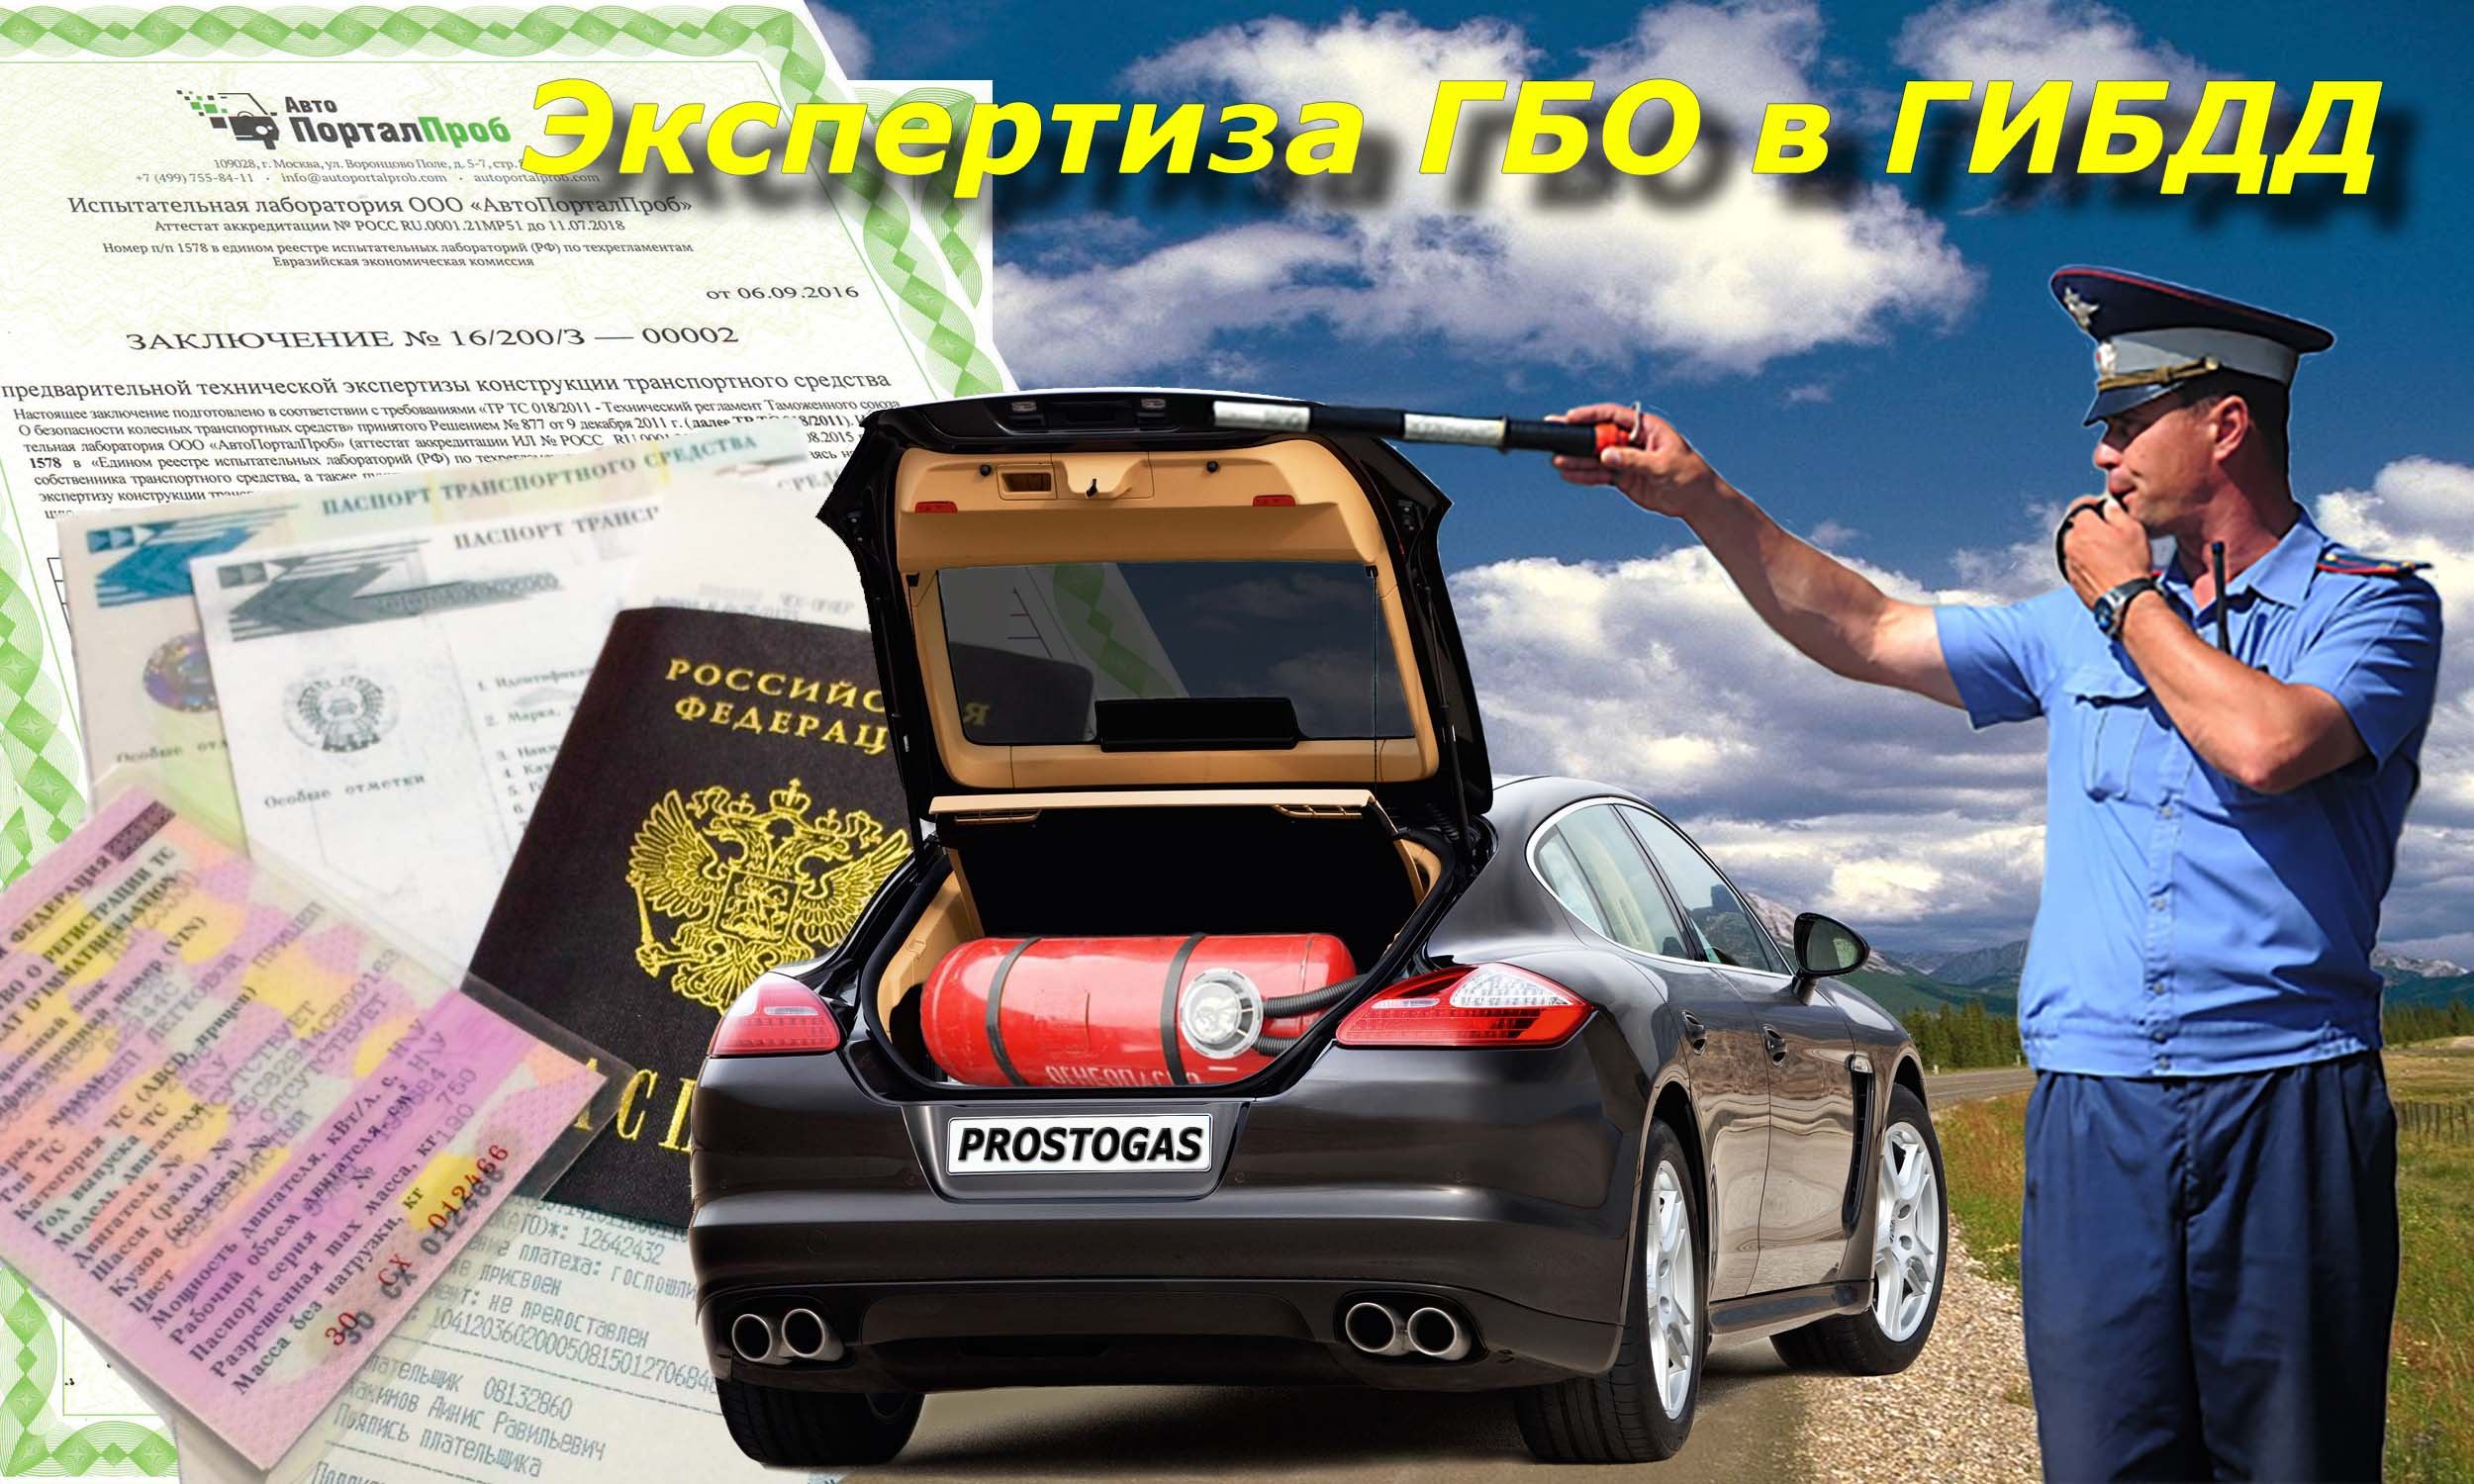 Кредит авто приора краснодар